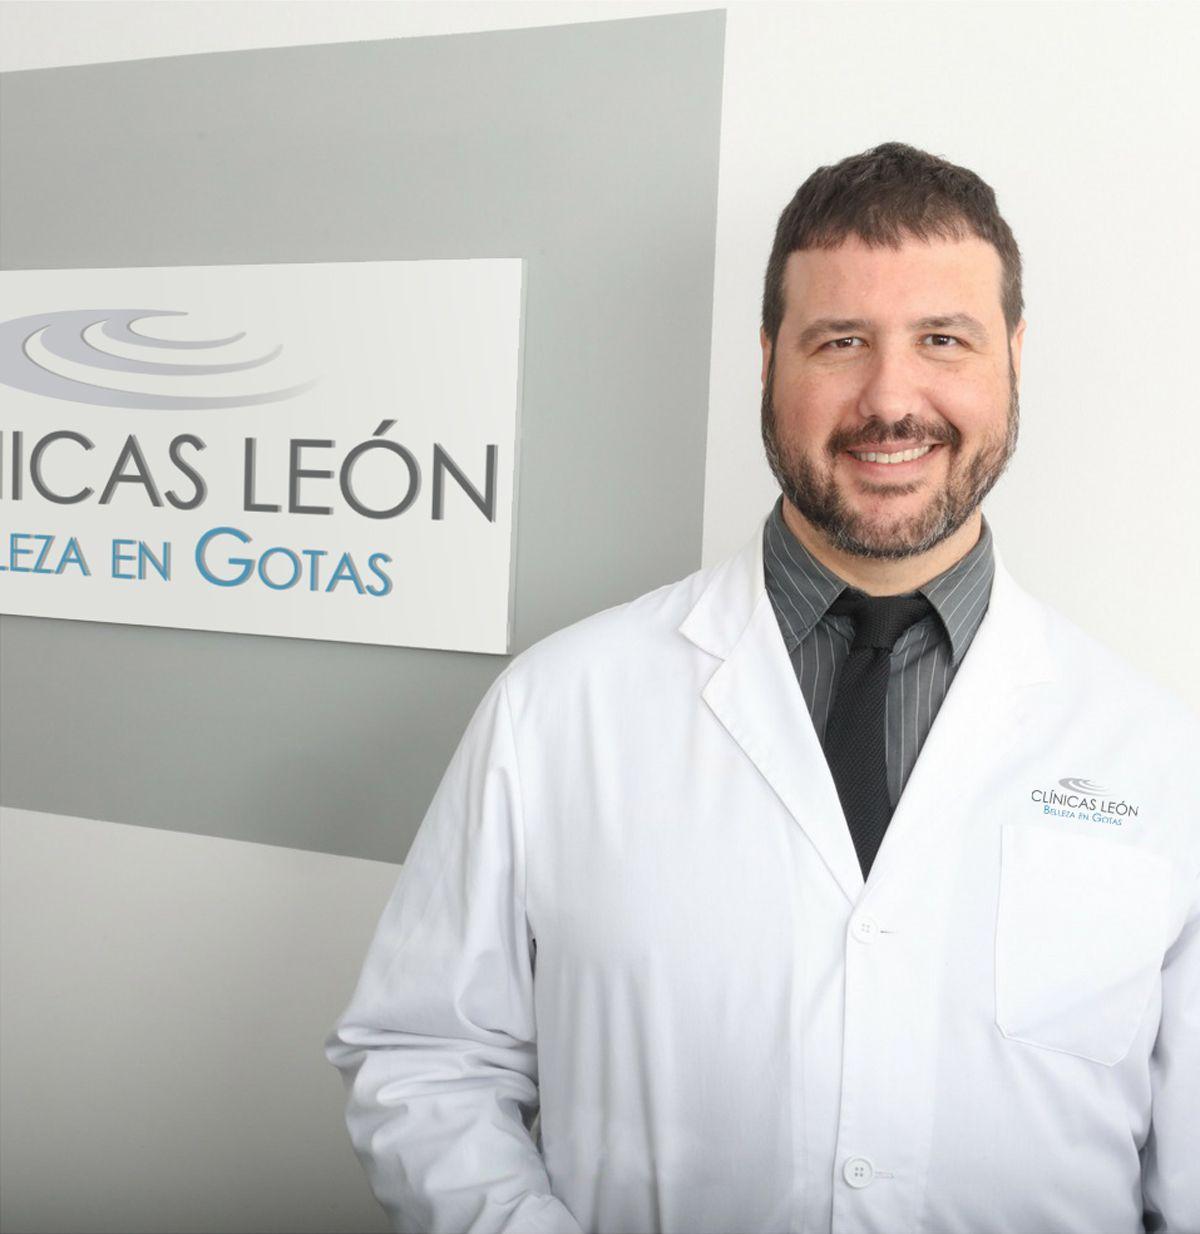 Foto de Clinicas León